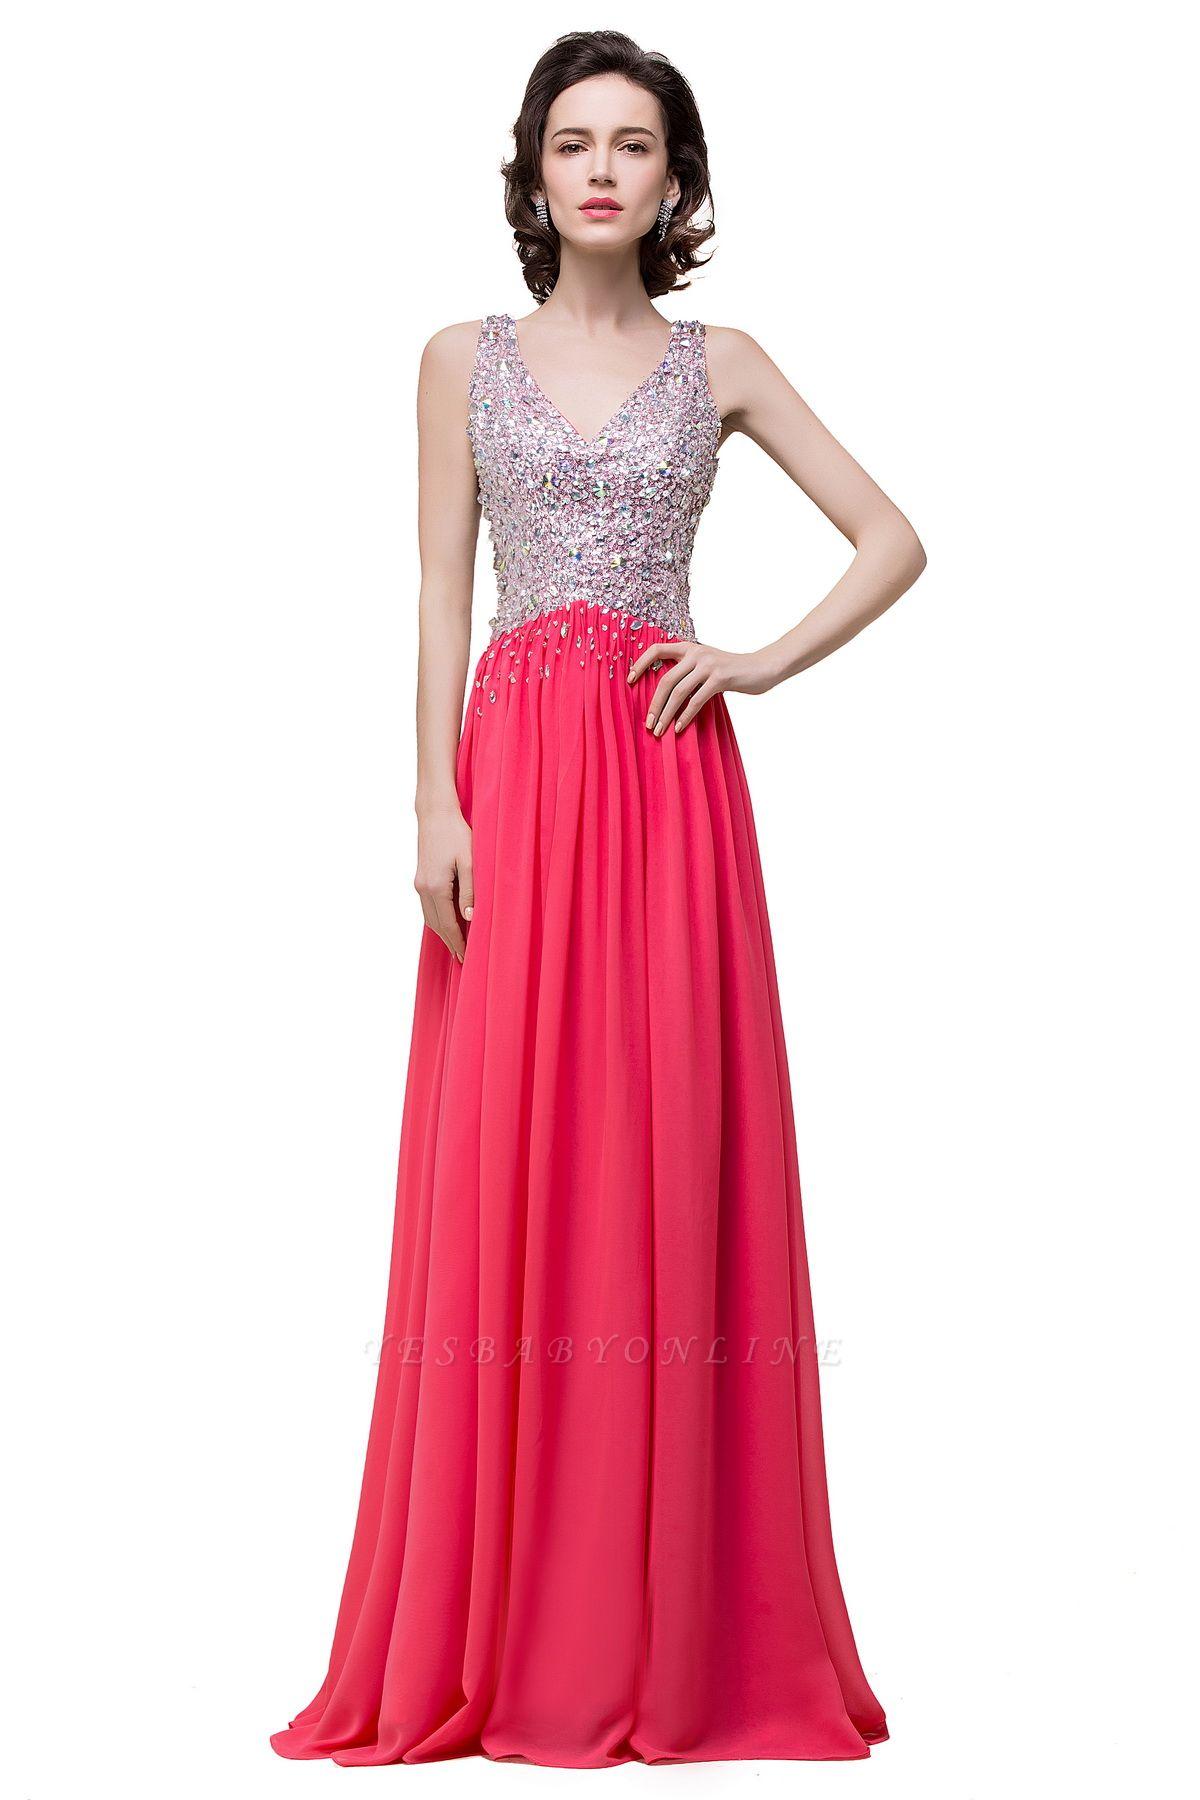 V-Neck A-Line Open-Back Modest Sleeveless Crystal Prom Dress